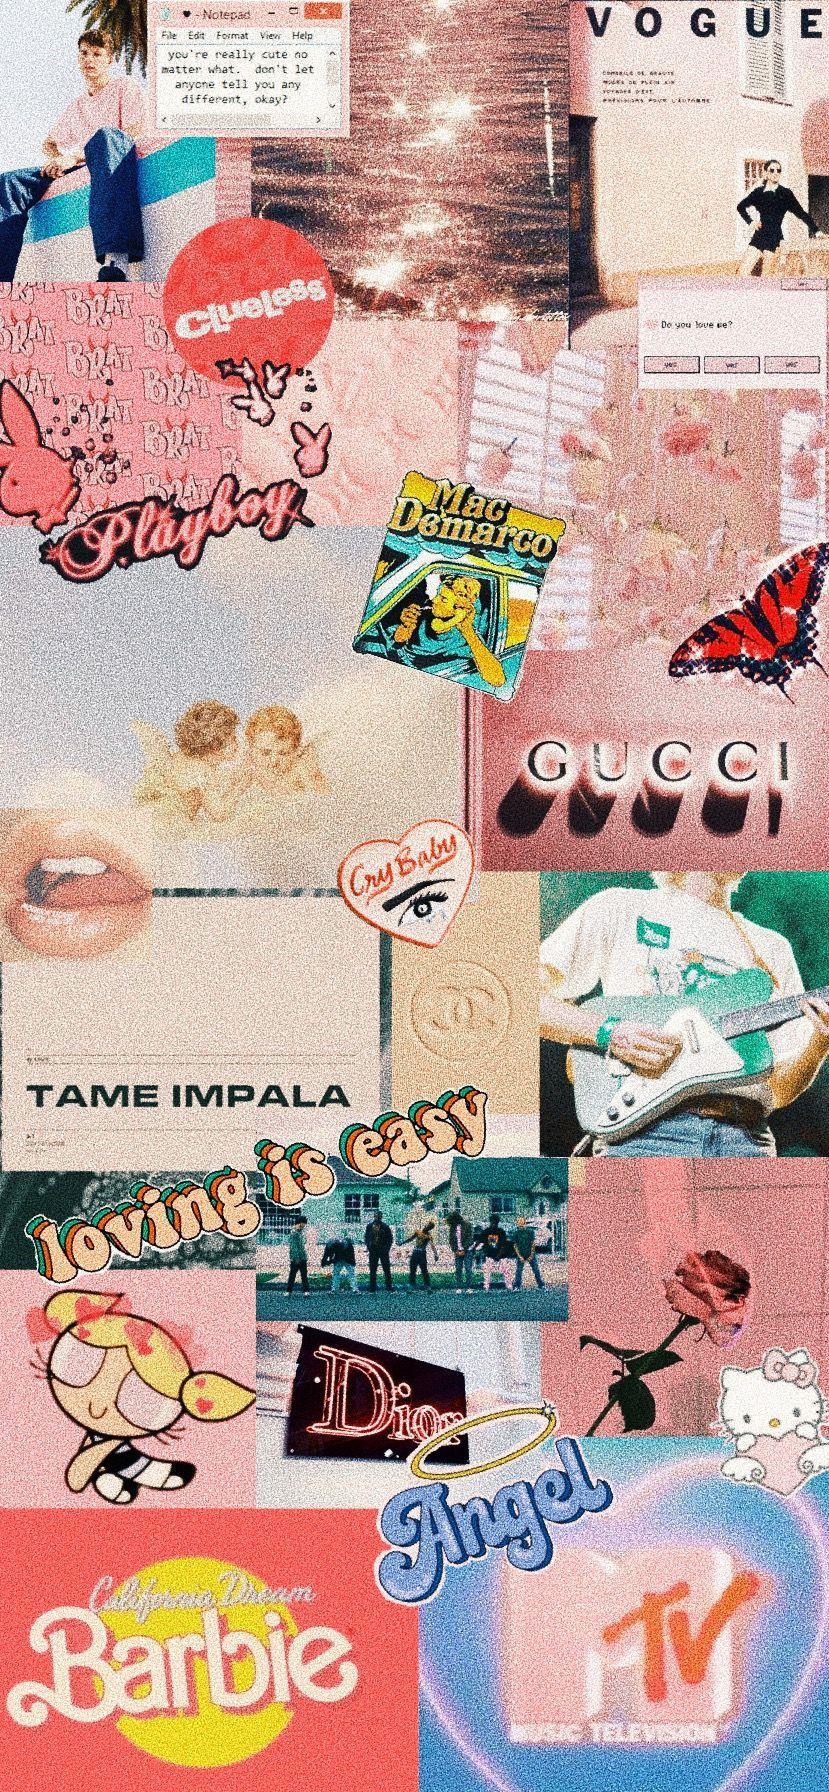 retro vintage aesthetic collage wallpaper iphone x xr xs Iphone 10 11 pink y2k 90s rex orange … in 2020   Pink wallpaper iphone, Aesthetic iphone wallpaper, Kitty wallpaper